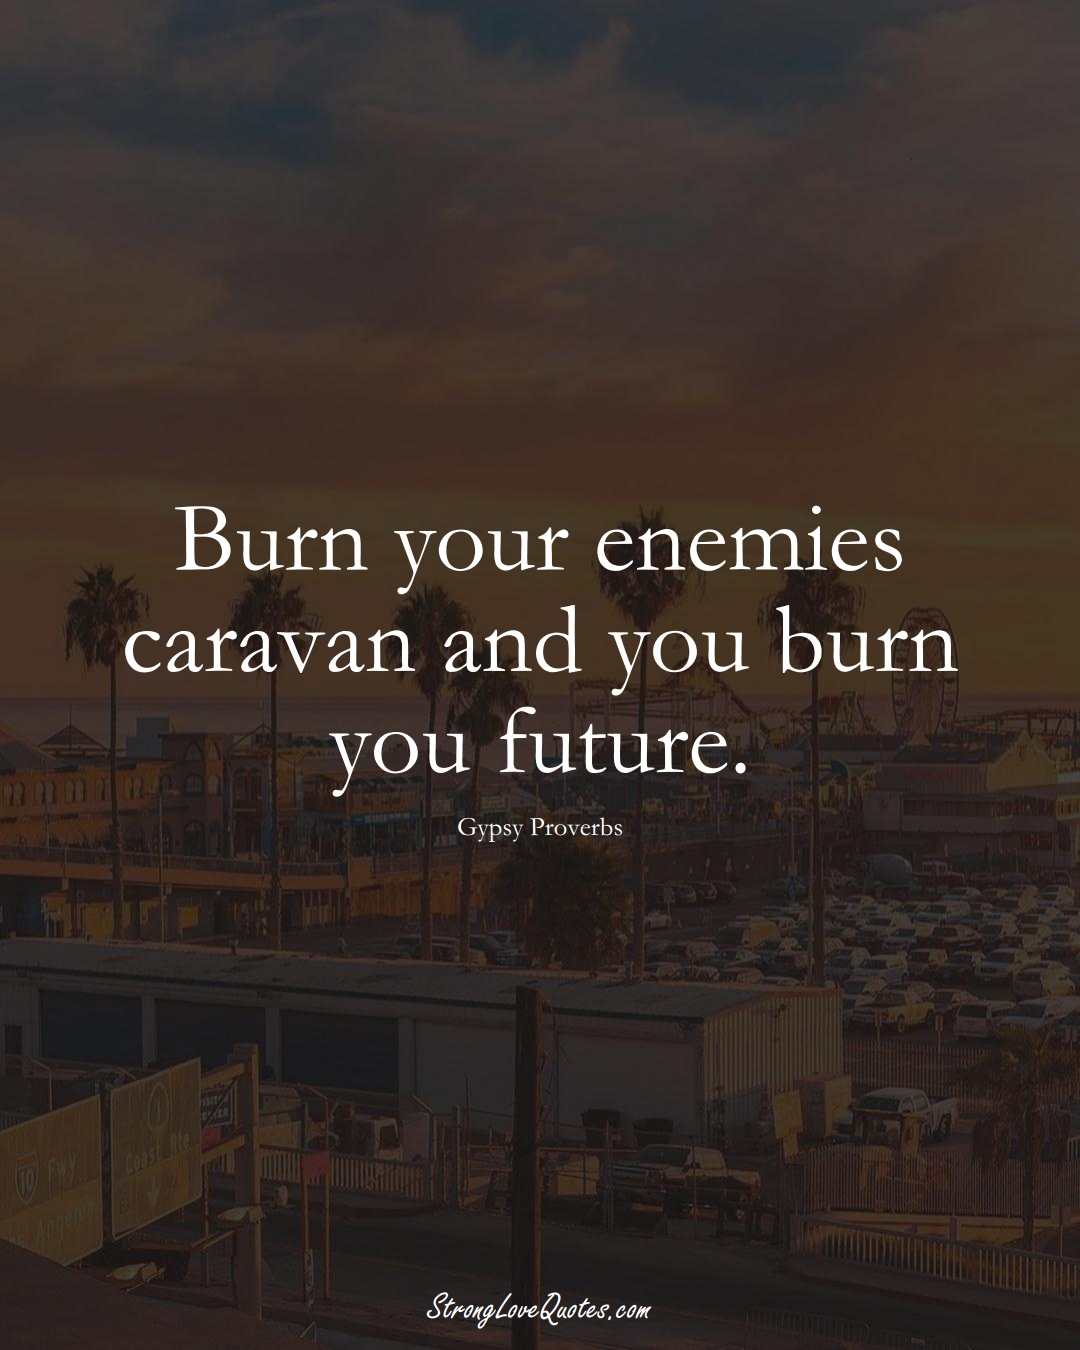 Burn your enemies caravan and you burn you future. (Gypsy Sayings);  #aVarietyofCulturesSayings